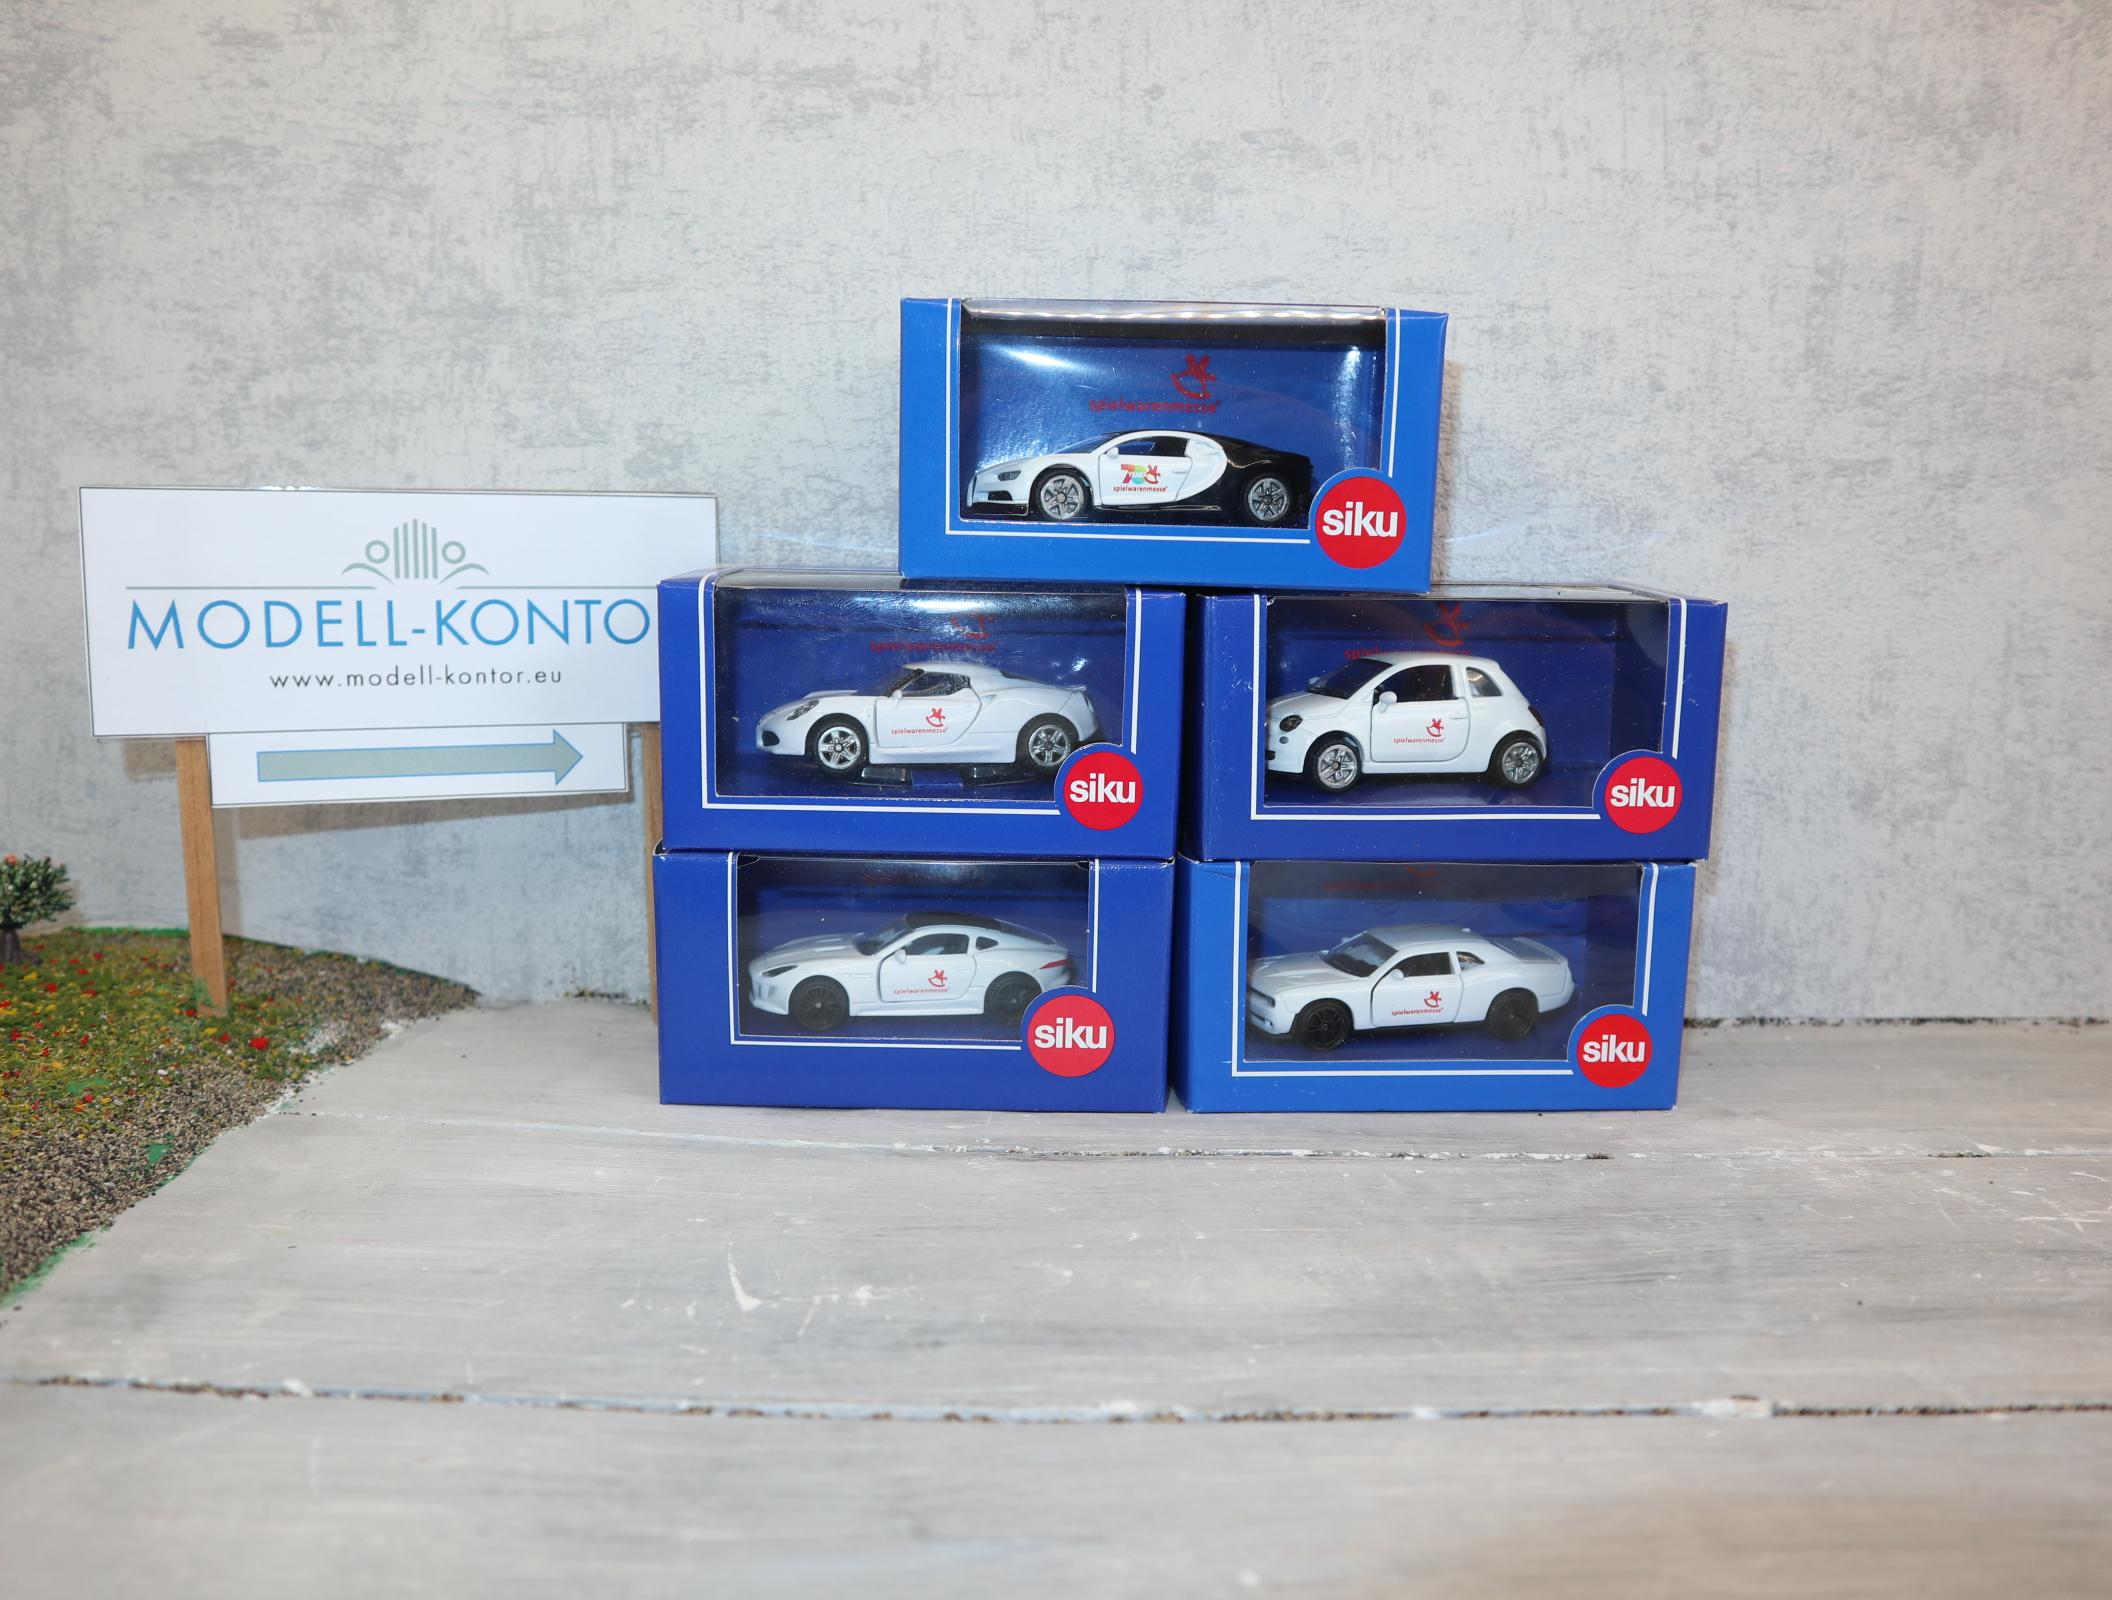 Siku PKW Sondermodelle Spielwarenmesse 5 Stück-Set 1508 1520 1453 1451 1408 in OVP